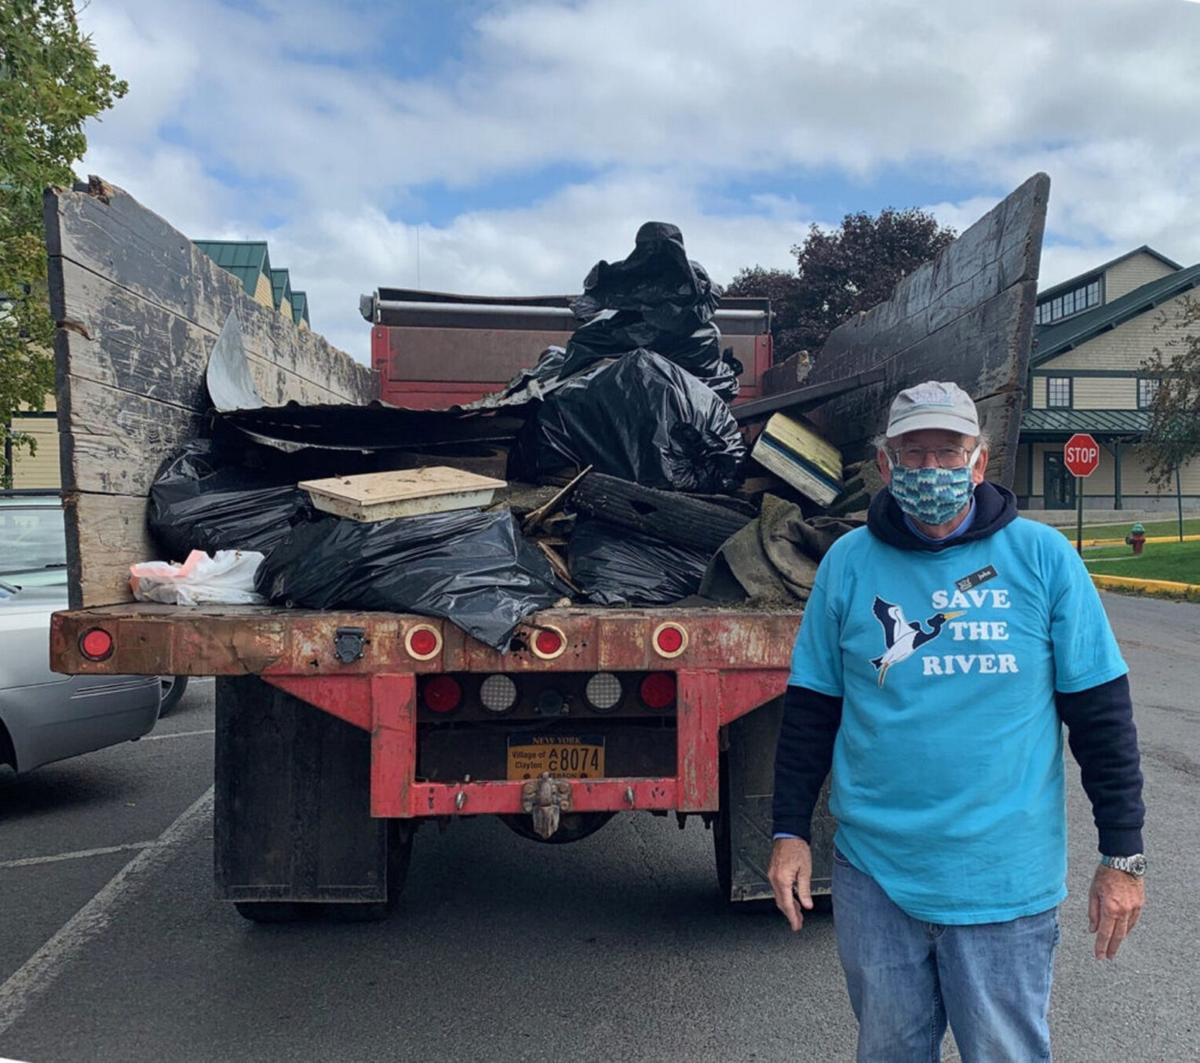 Keeping St. Lawrence River trash-free